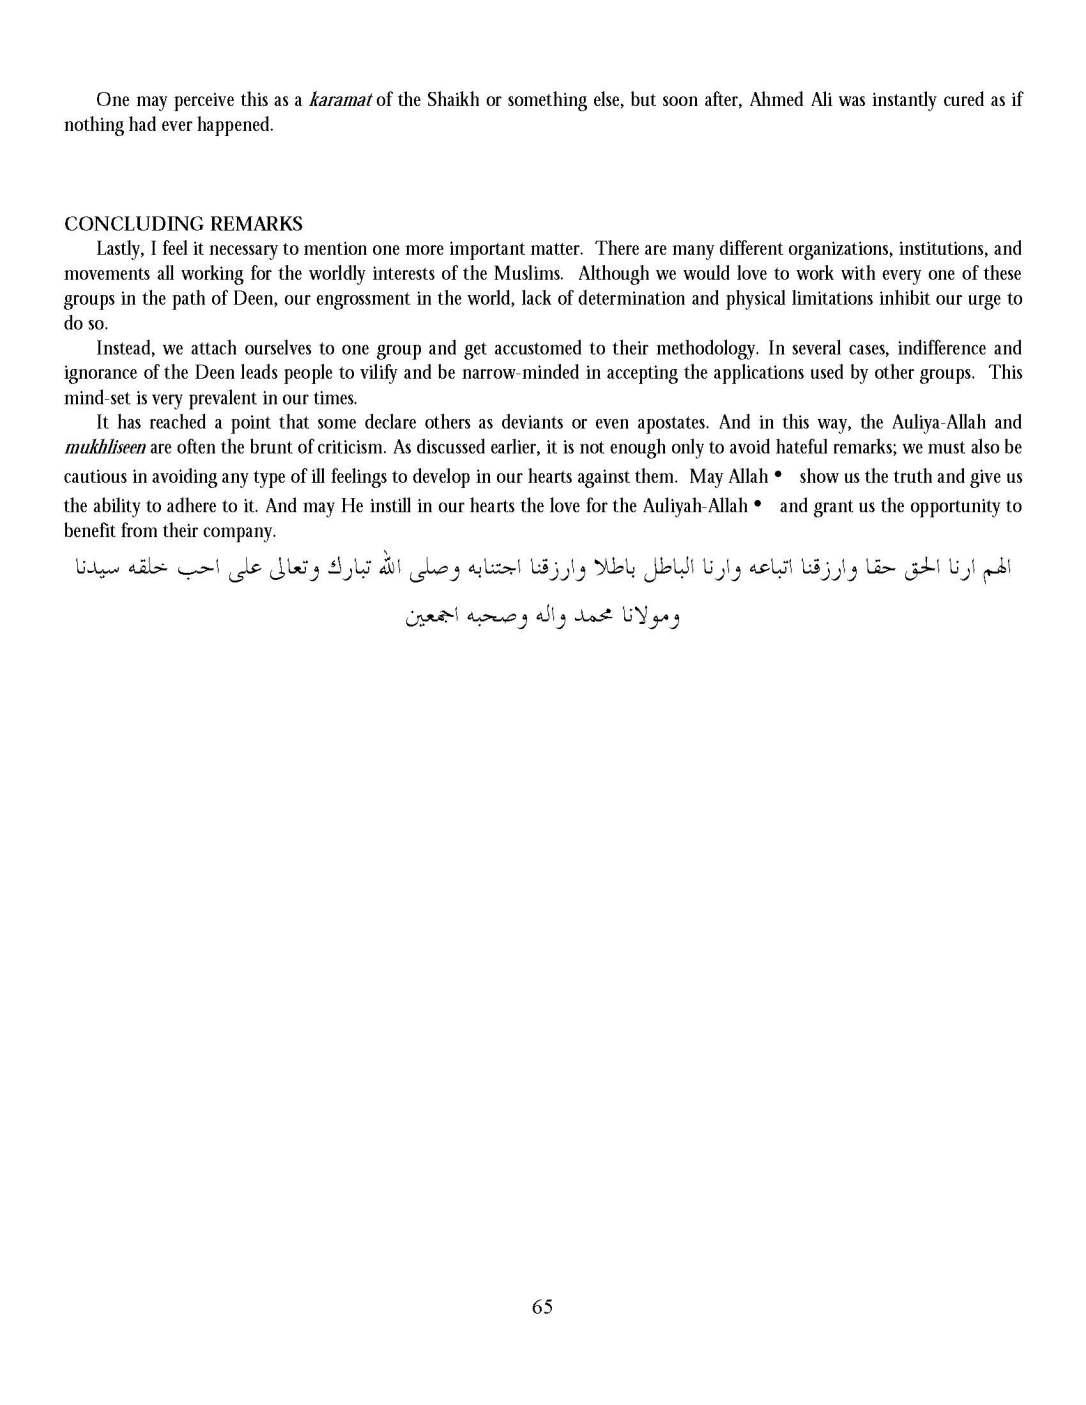 ConsequencesOfDebasingAuliyaAllah_Page_66